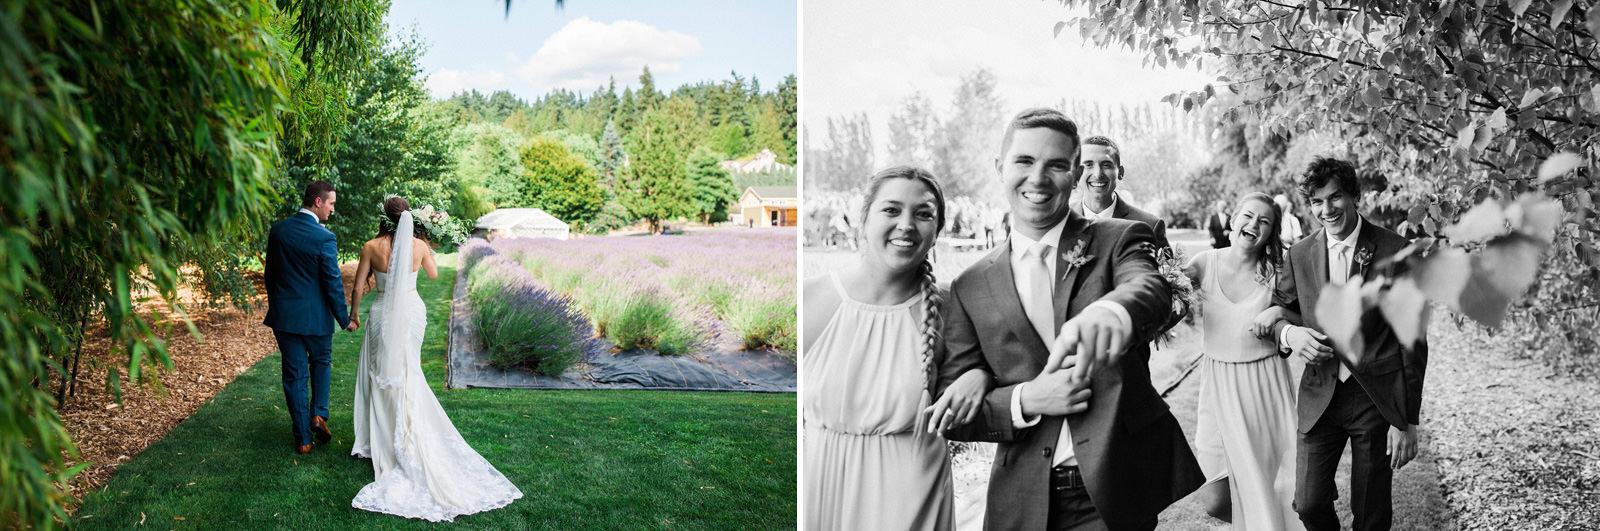 048-woodinville-lavendar-farm-wedding-with-golden-glowy-photos.jpg